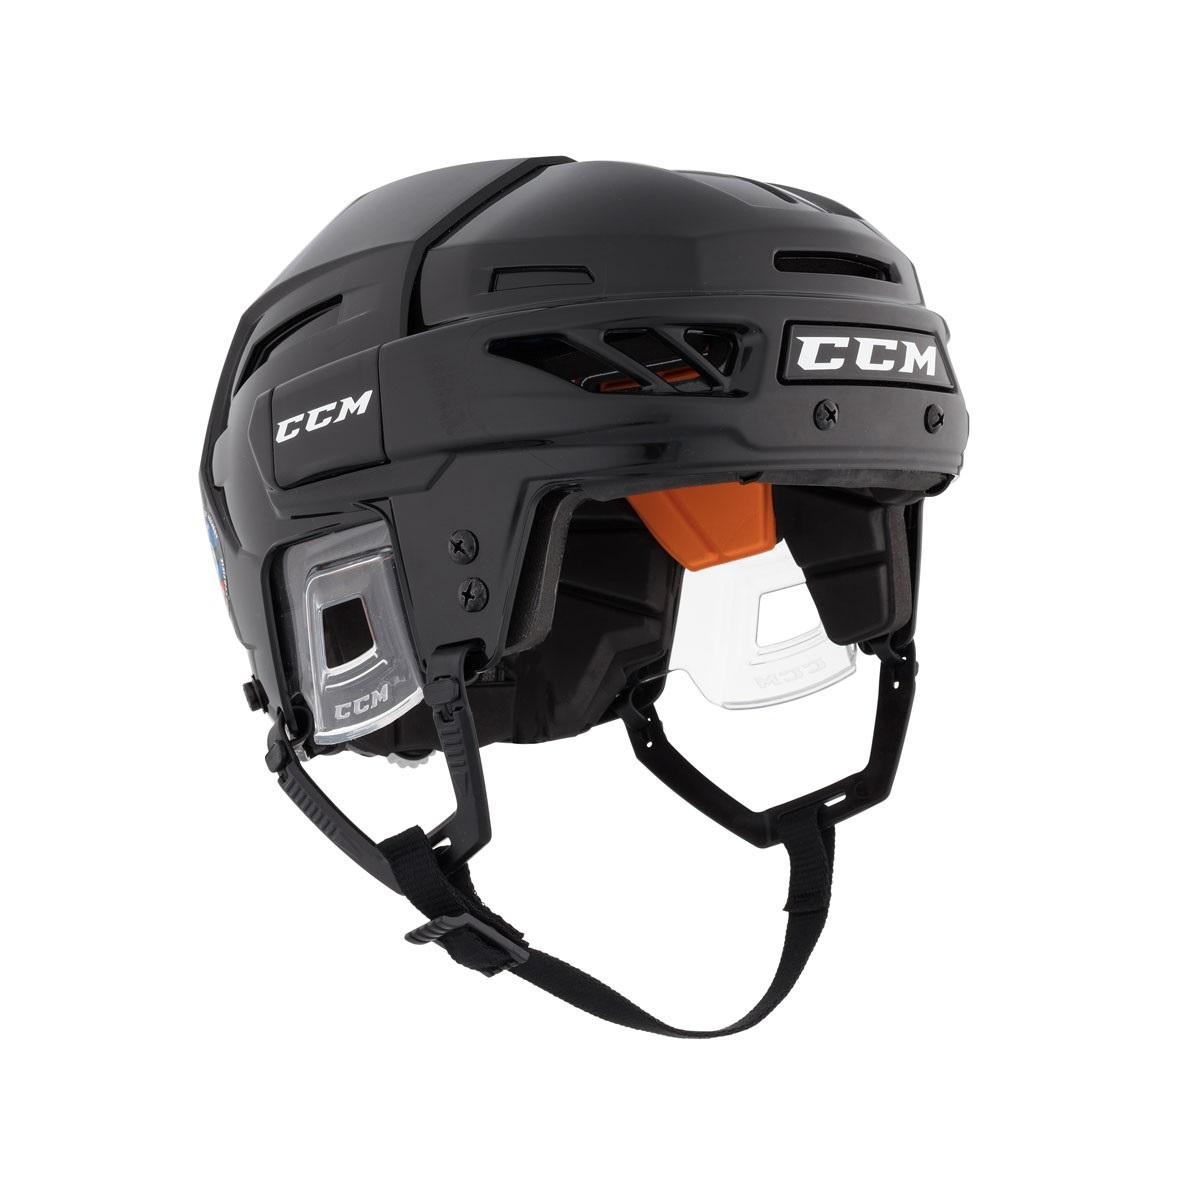 f09e1f38f58 CCM Fitlite 90 Hockey Helmet